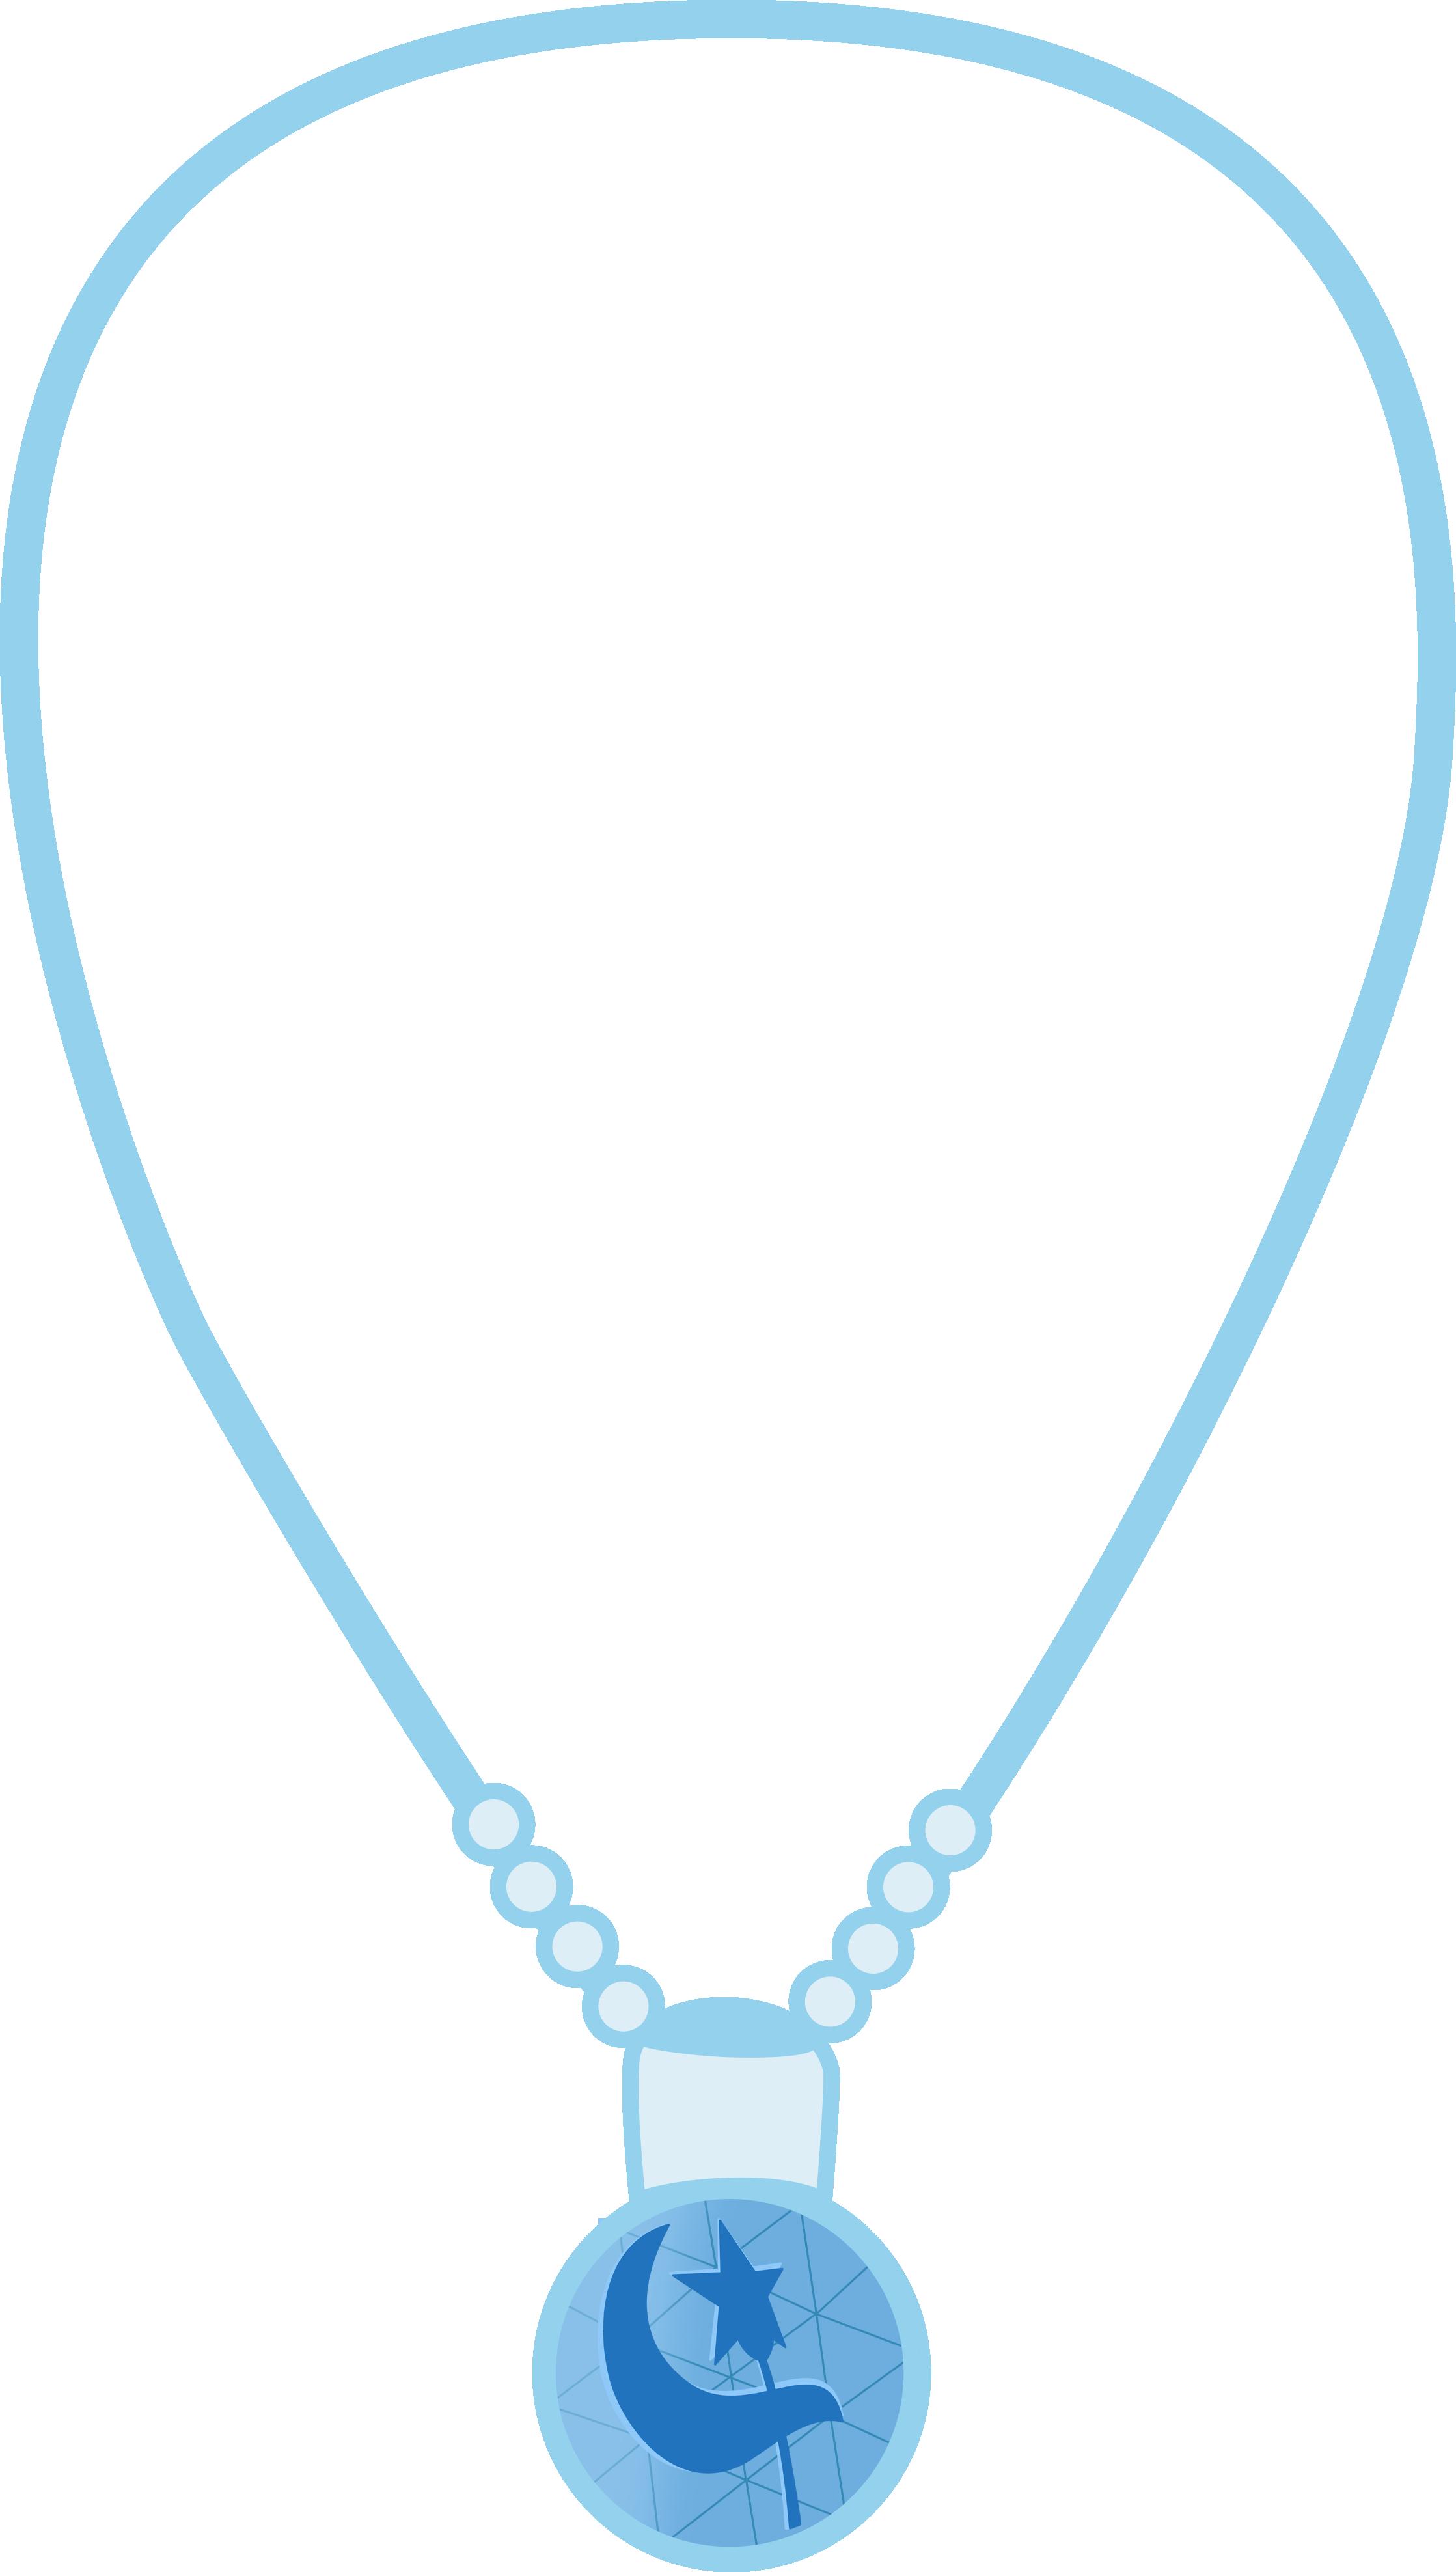 Trixie Lulamoon Necklace By Sasami87 On Deviantart